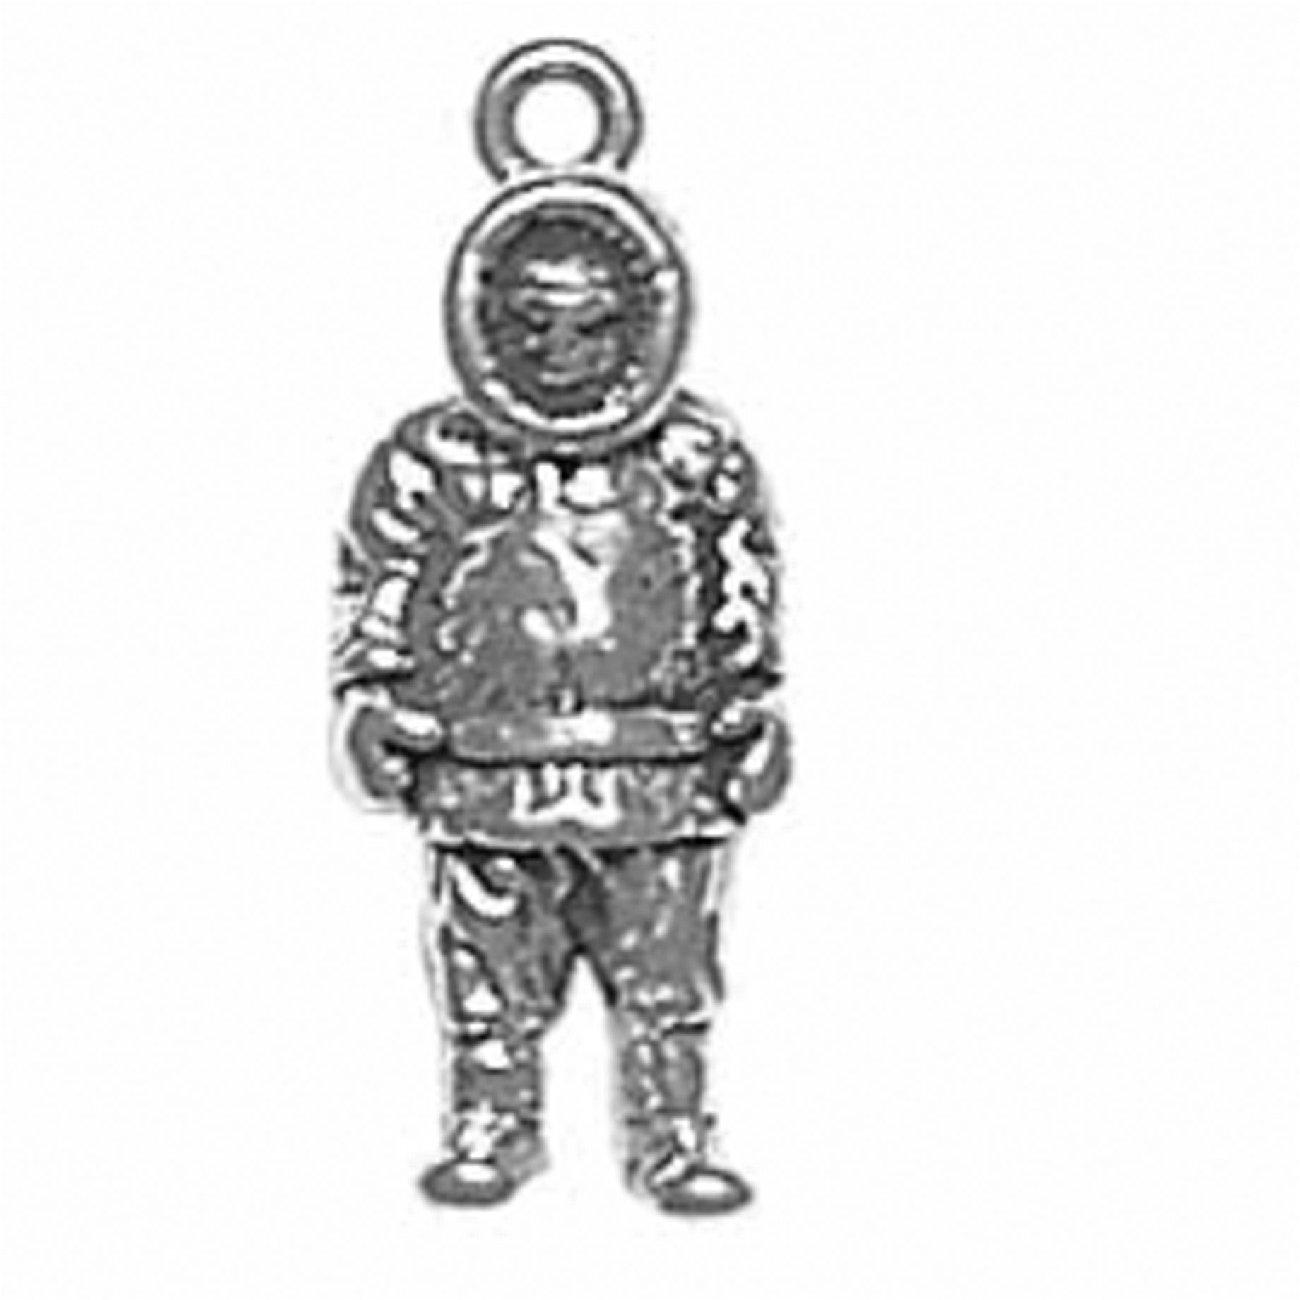 Sterling Silver Charm Bracelet Attached 3D Standing Artic Explorer Eskimo Charm